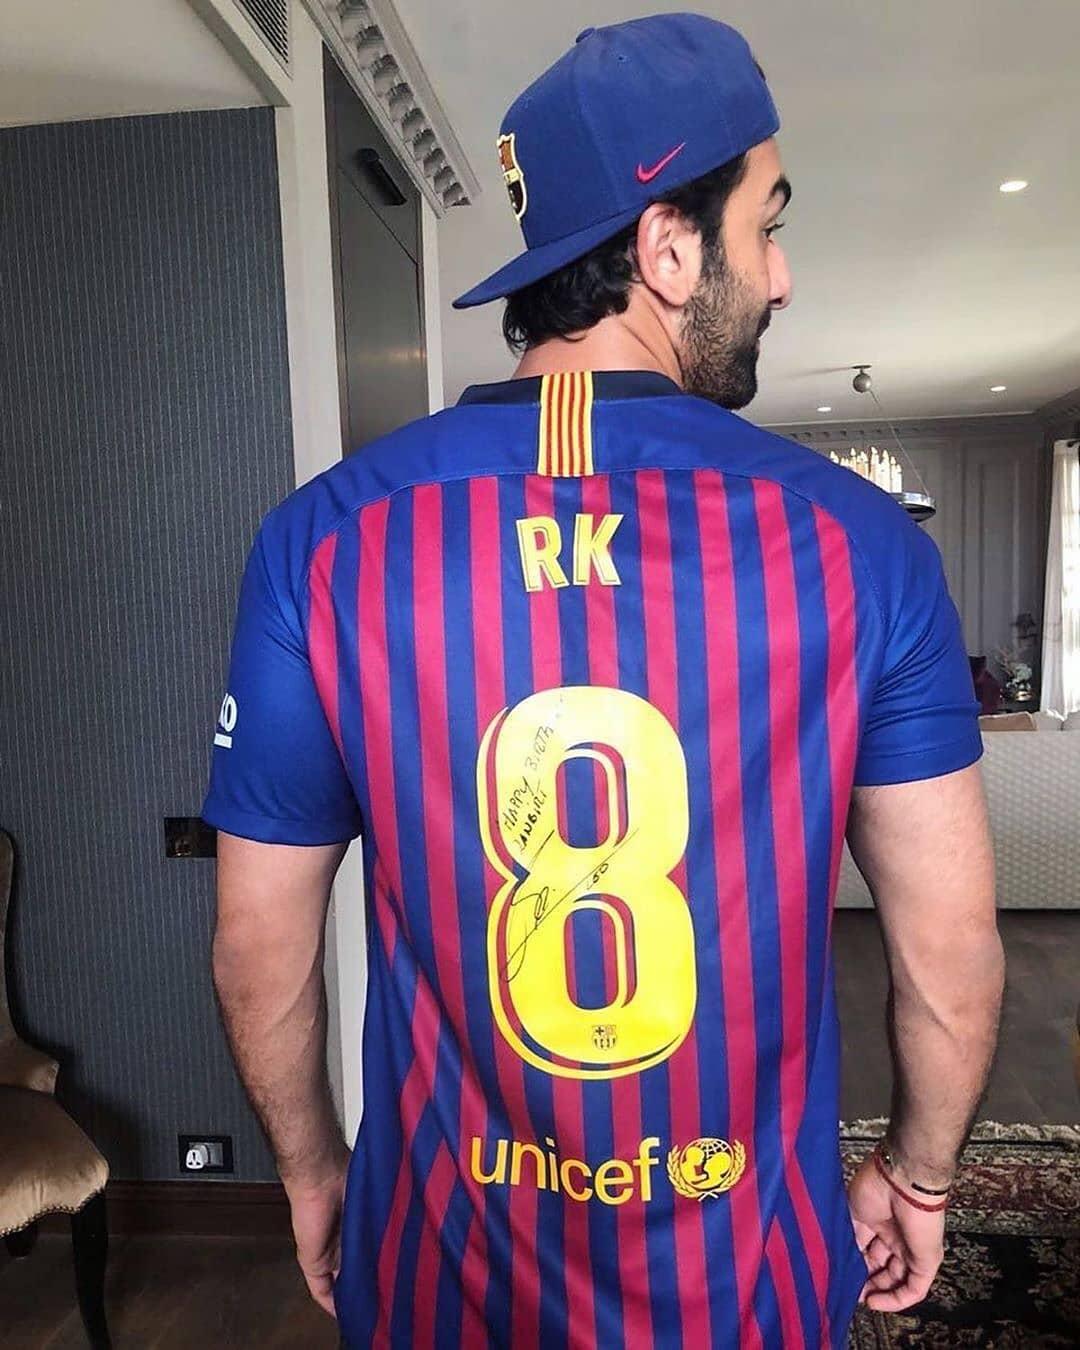 Ranbir Kapoor With 8 Number Jersey